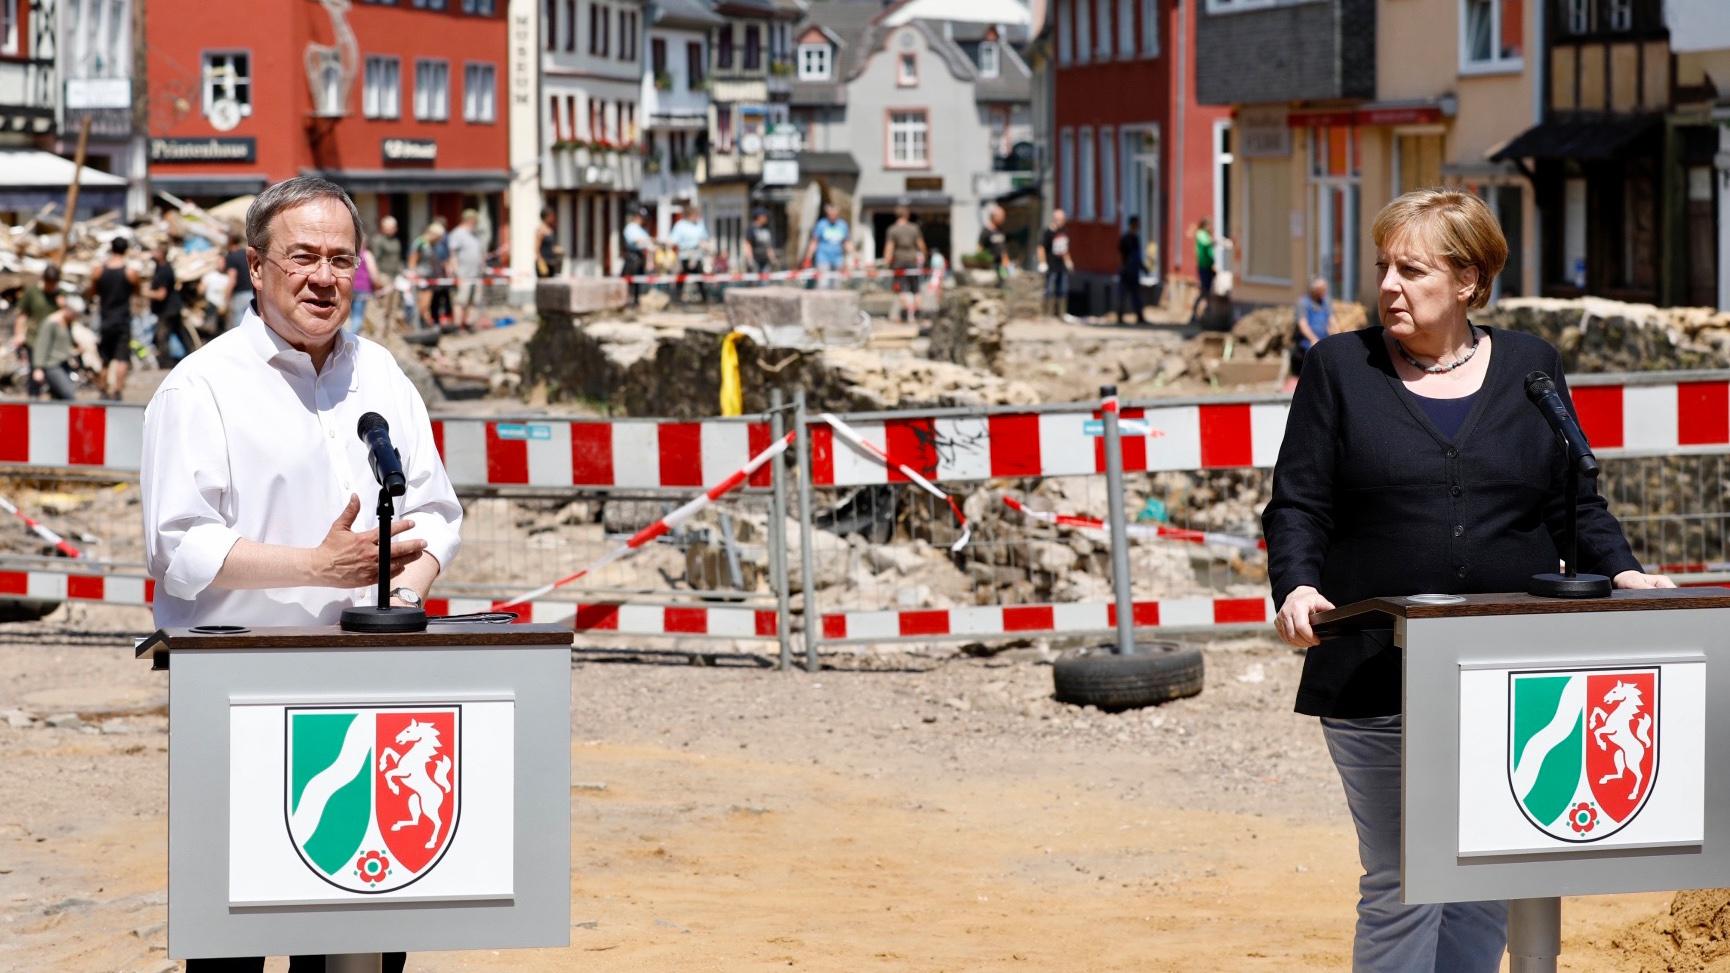 Germania Campagna Elettorale